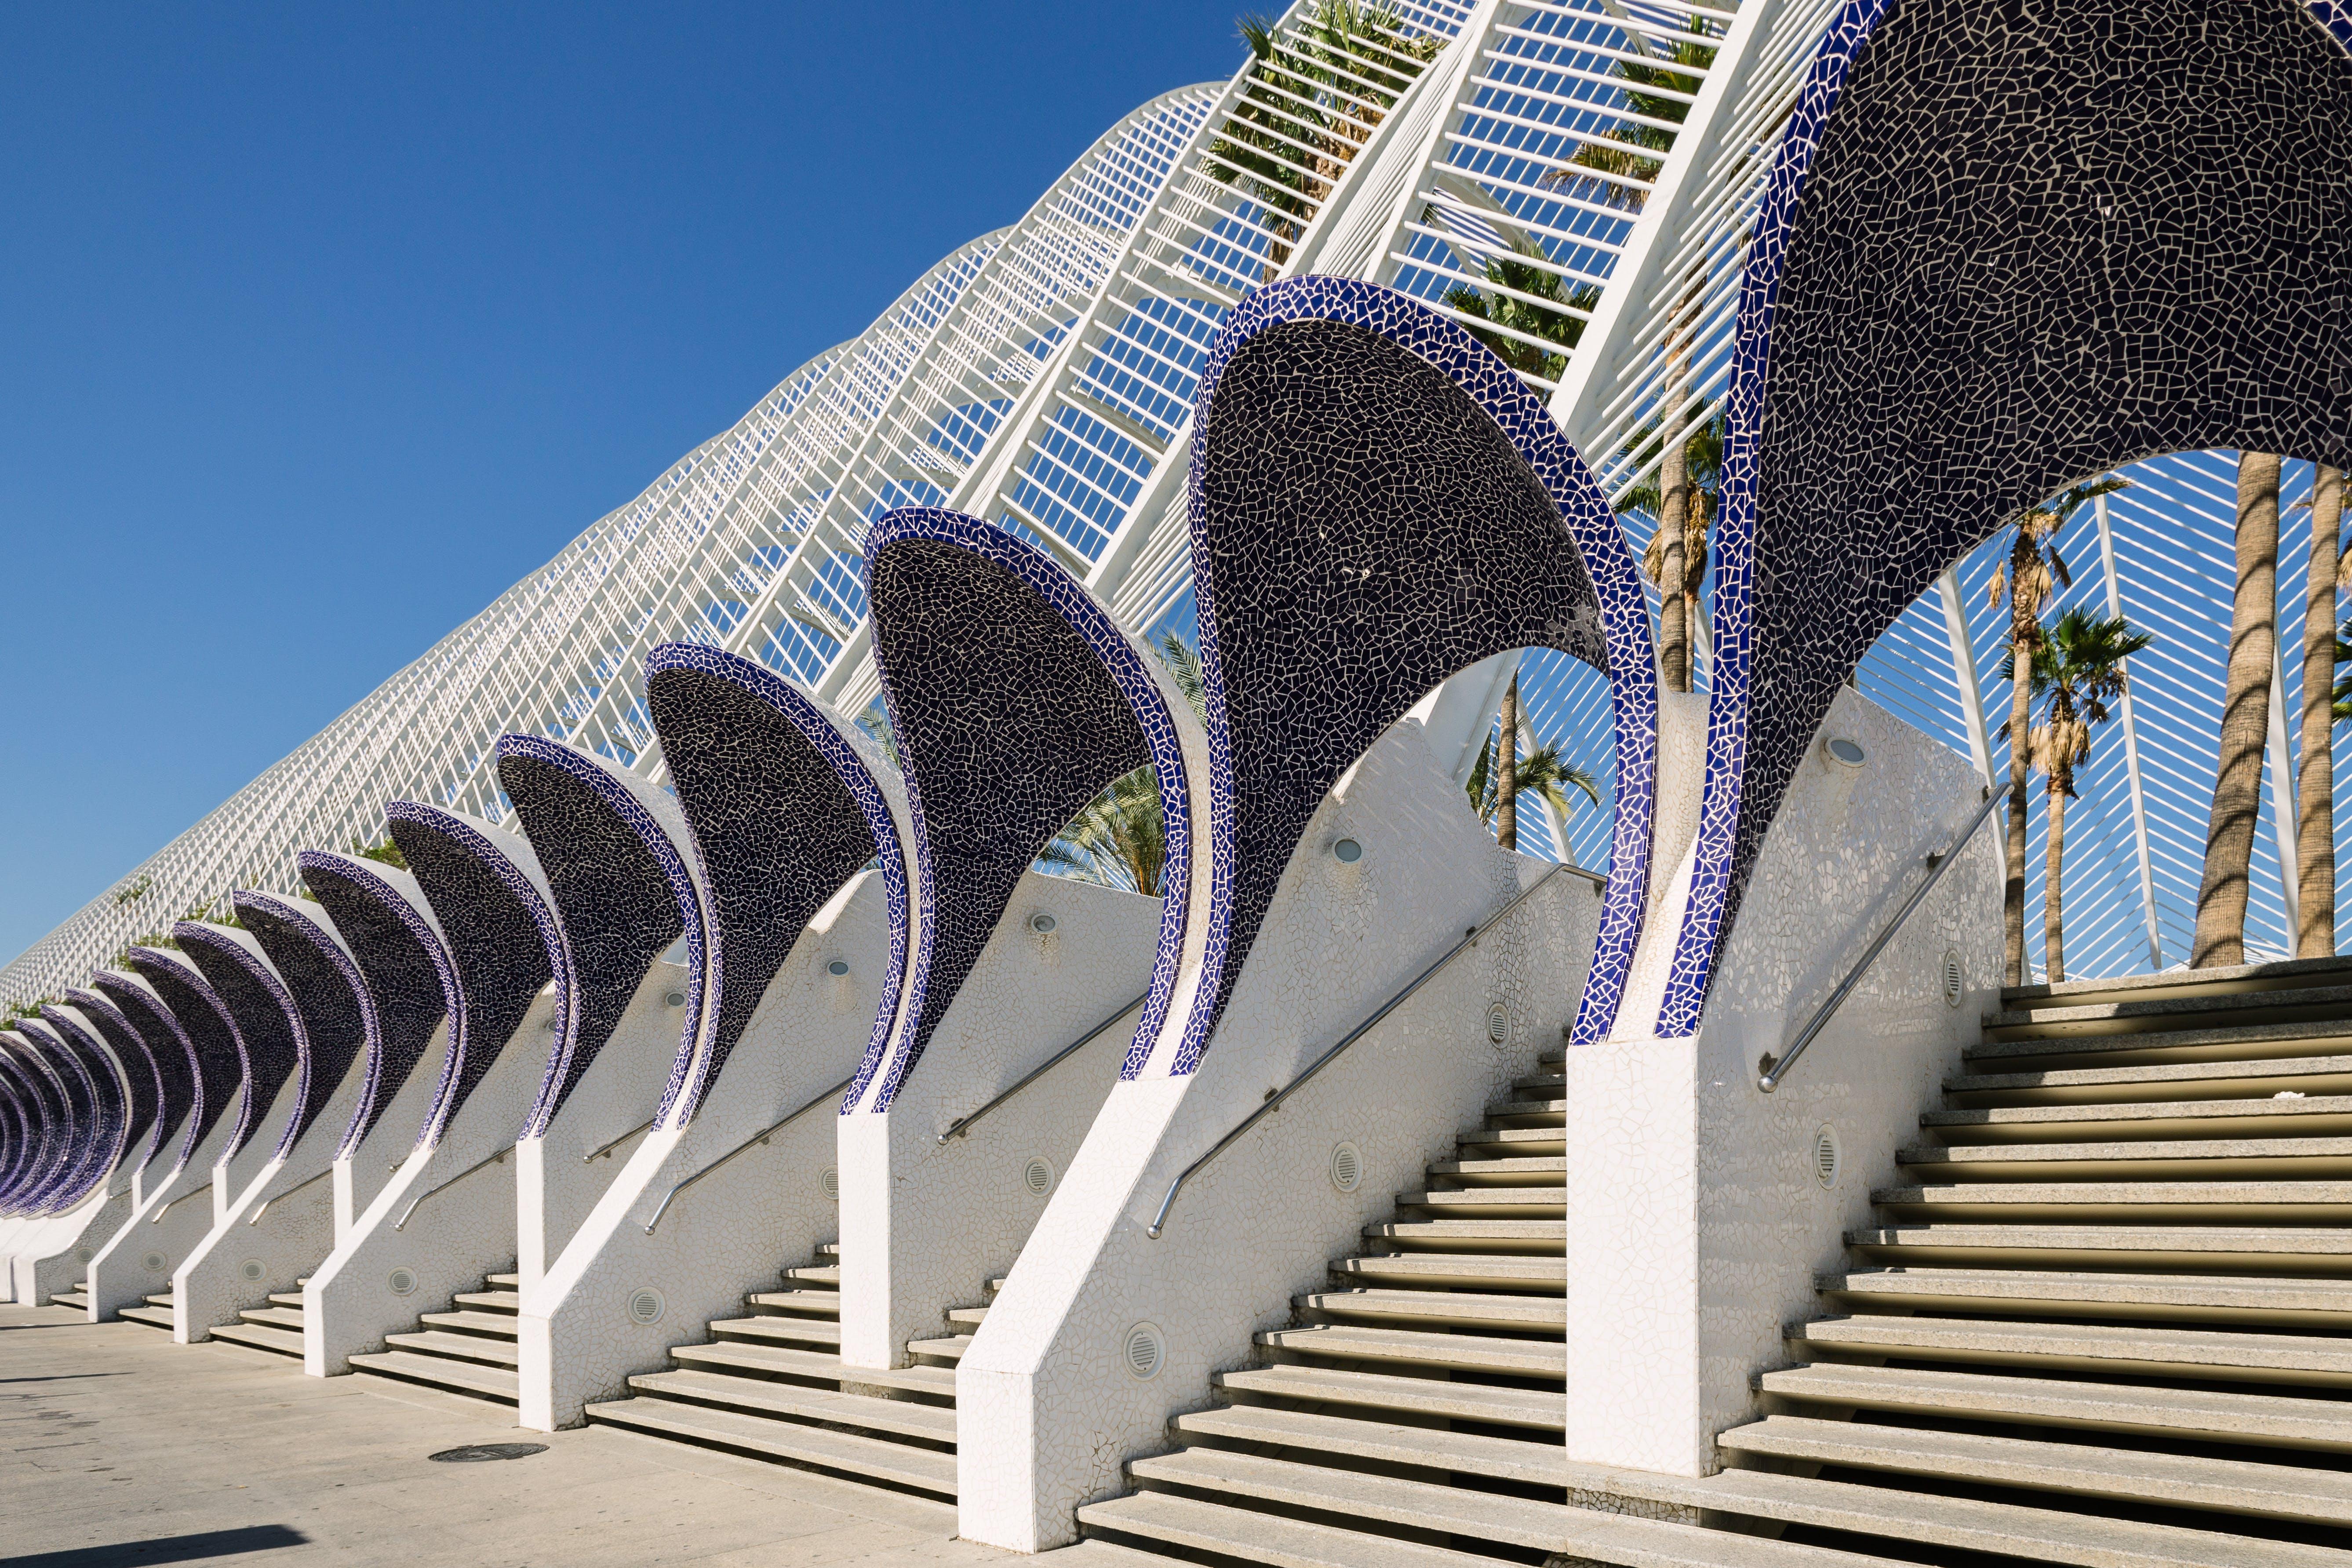 Free stock photo of architecture, calatrava, city of arts and sciences, spain